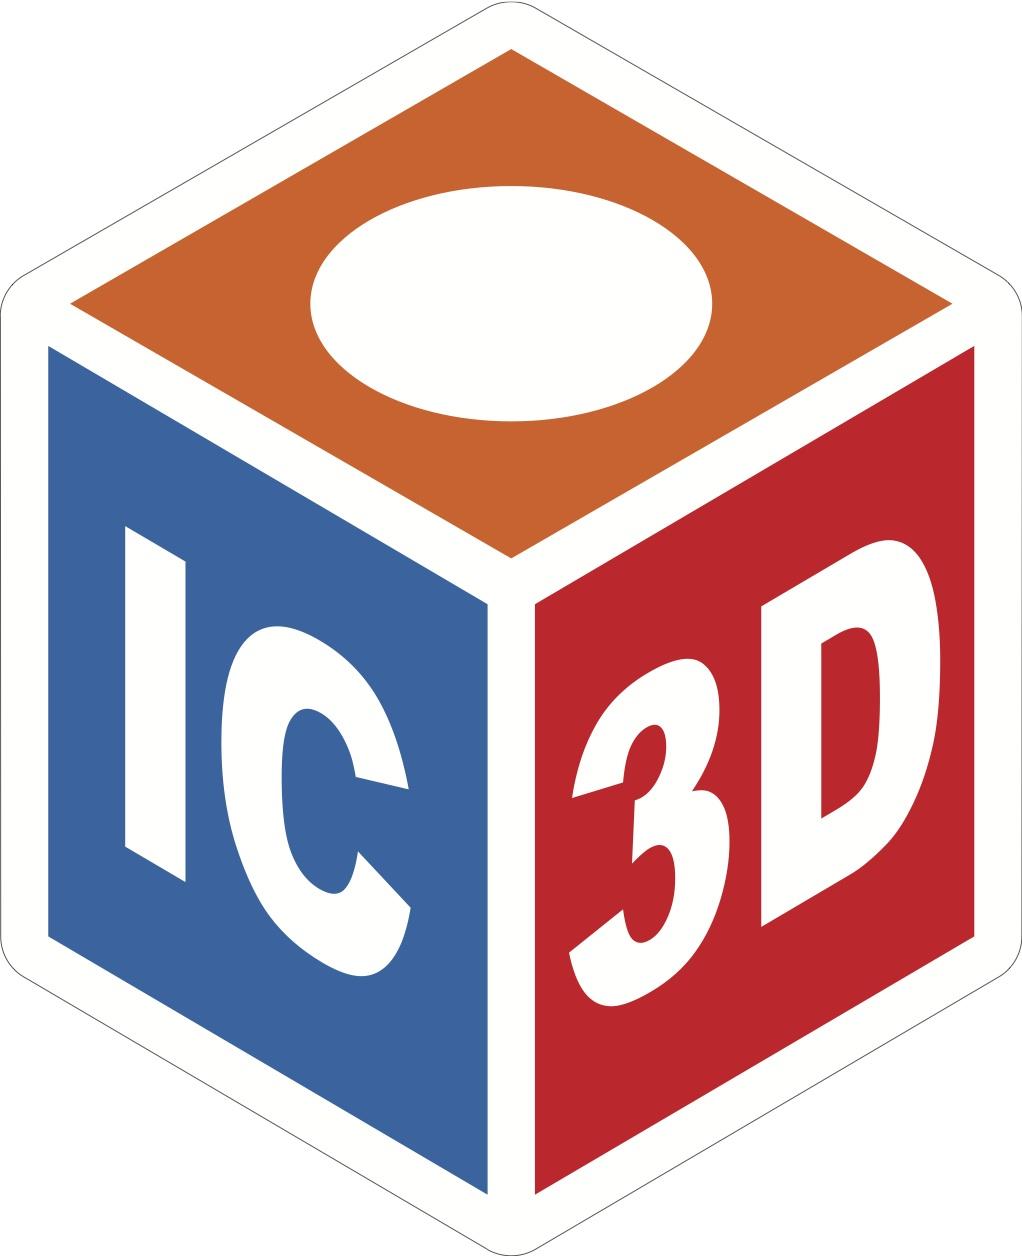 IC3D_border_CMYK.jpg